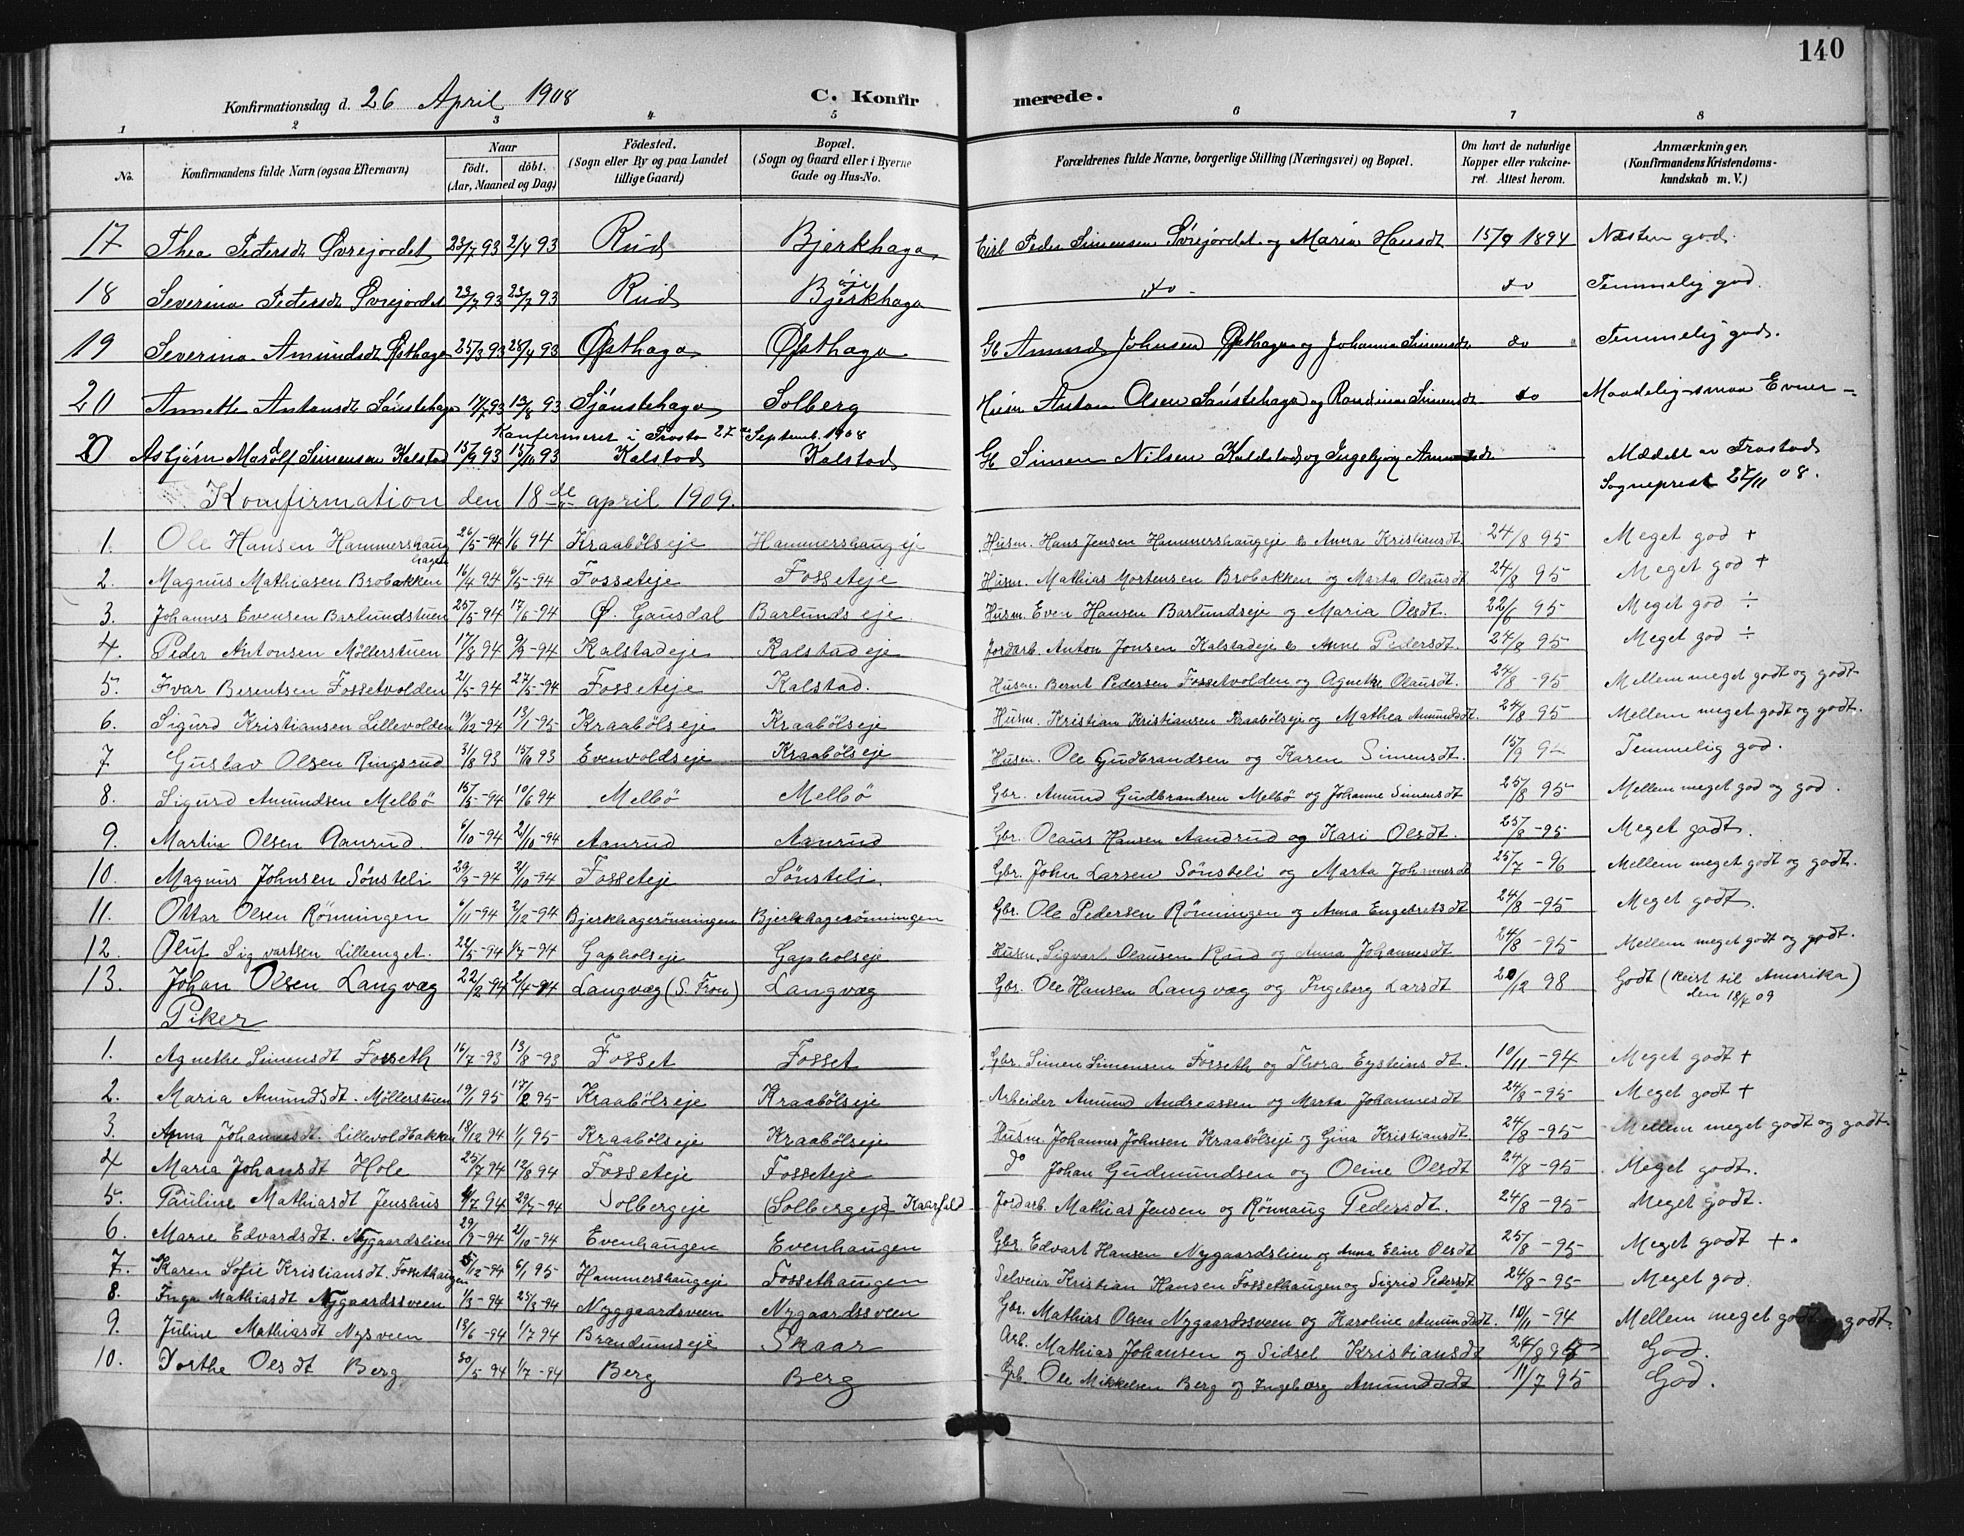 SAH, Vestre Gausdal prestekontor, Klokkerbok nr. 3, 1896-1925, s. 140